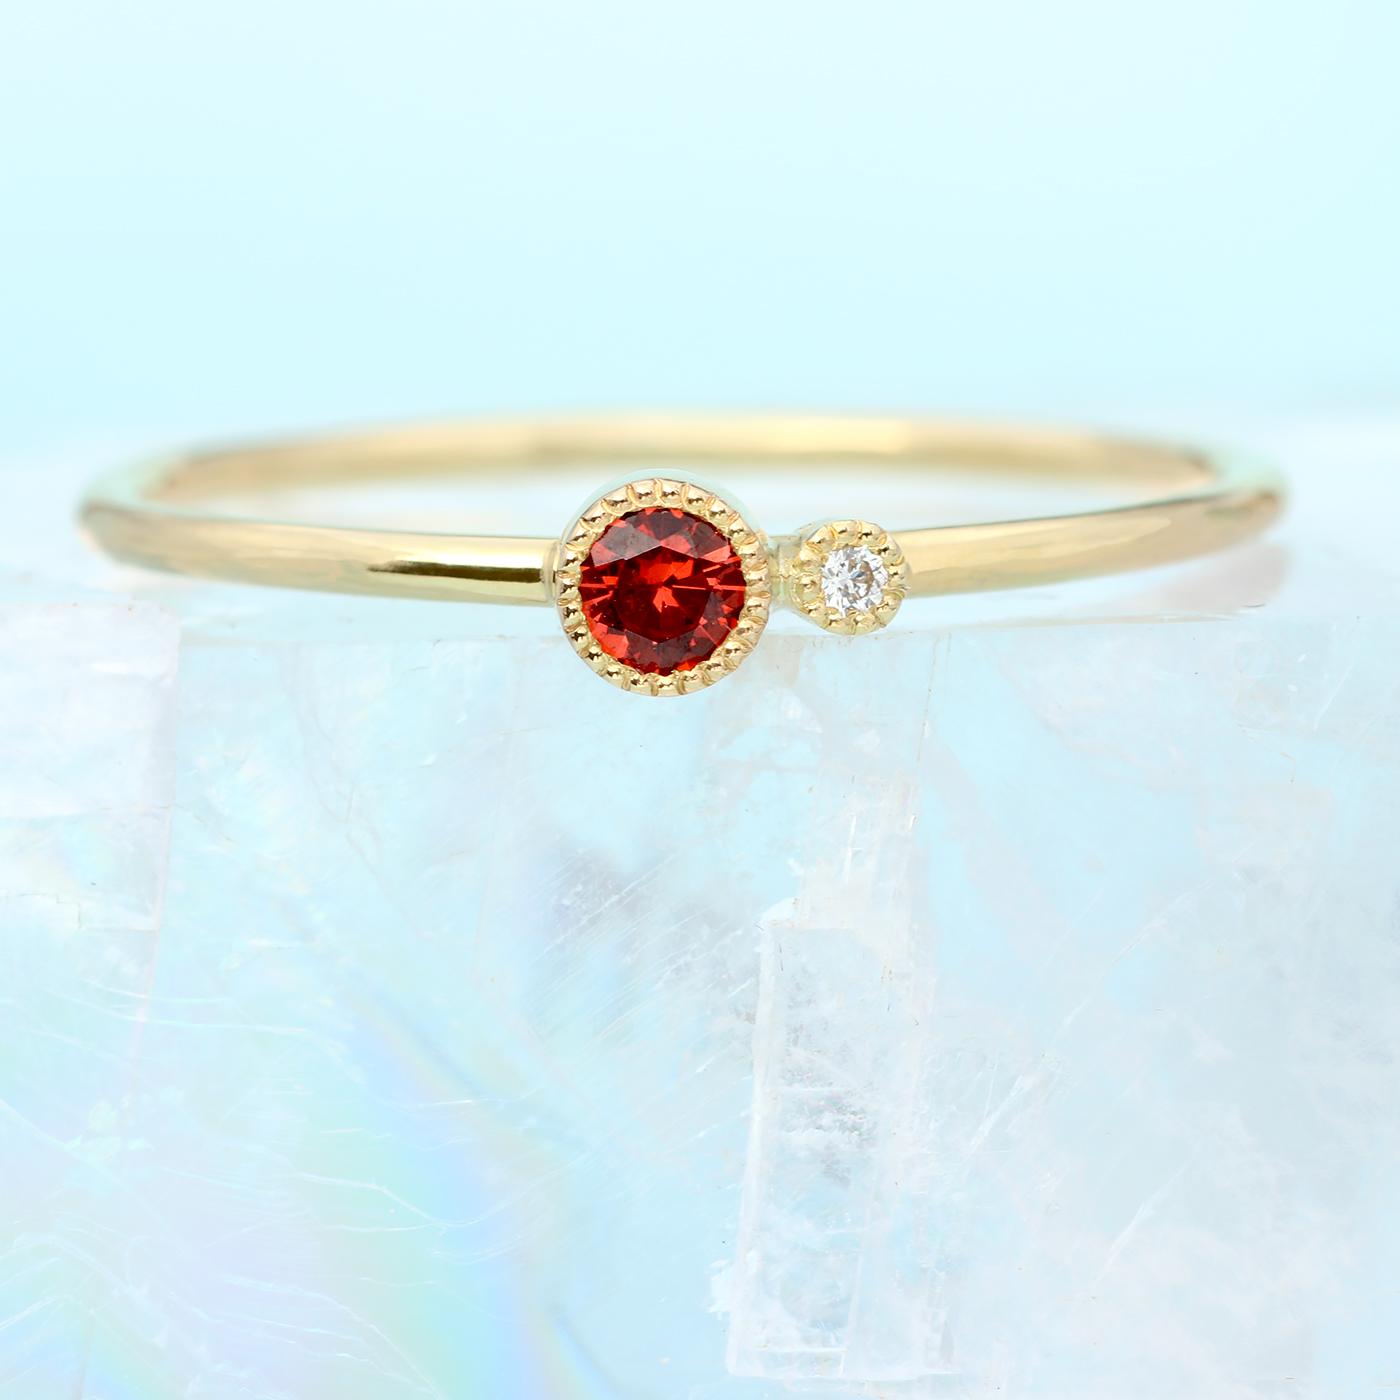 58006e40faef74 18ct Gold Garnet Birthstone Stacking Ring - Lilia Nash Jewellery